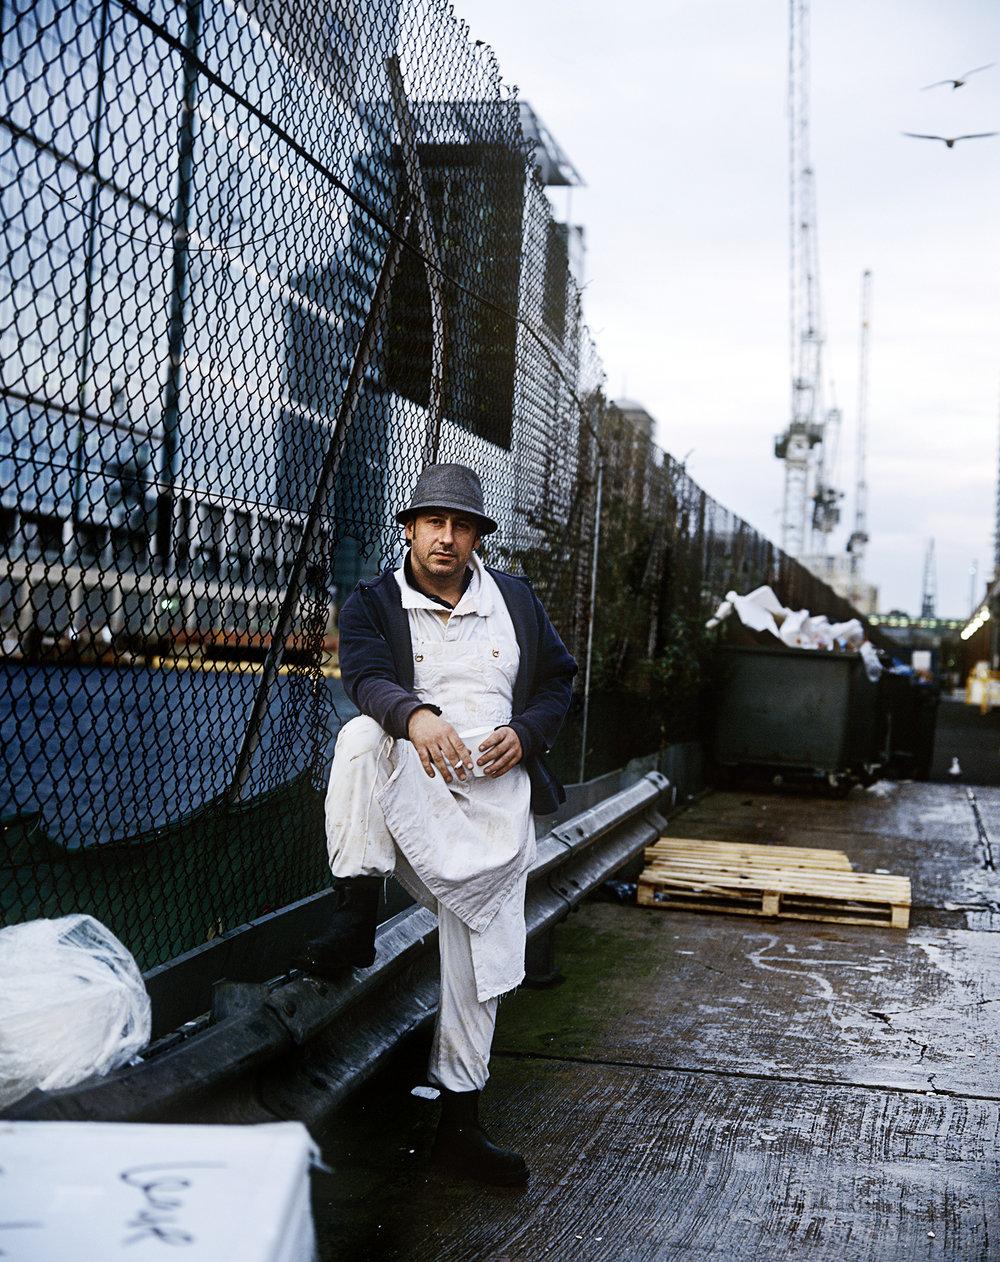 Martin Bicker, fish porter for 24 years.